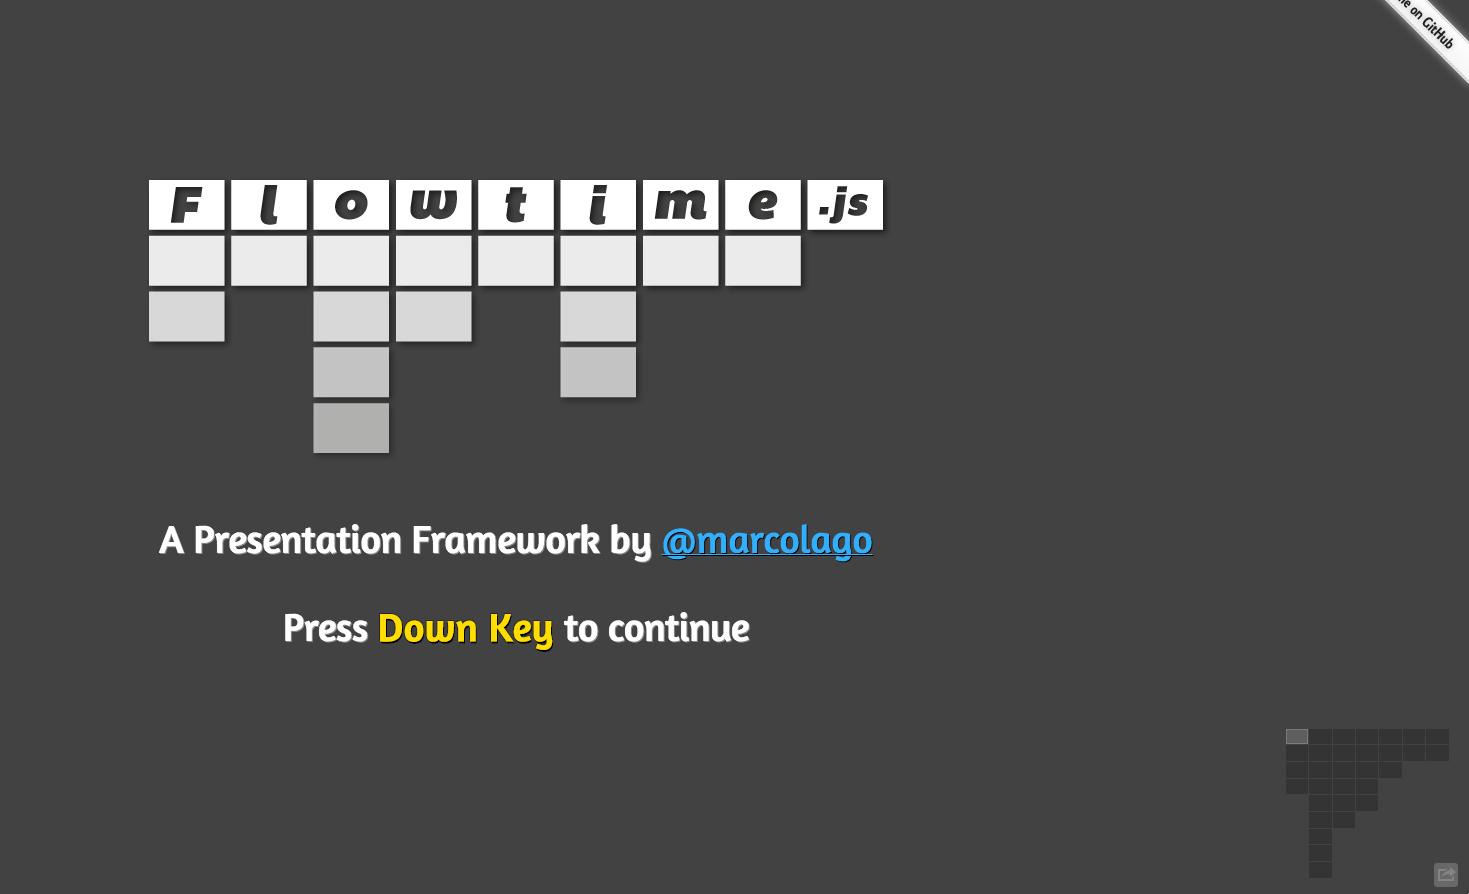 https://github.com/marcolago/flowtime.js - Flowtime.js is a framework for easily build HTML presentations or websites.